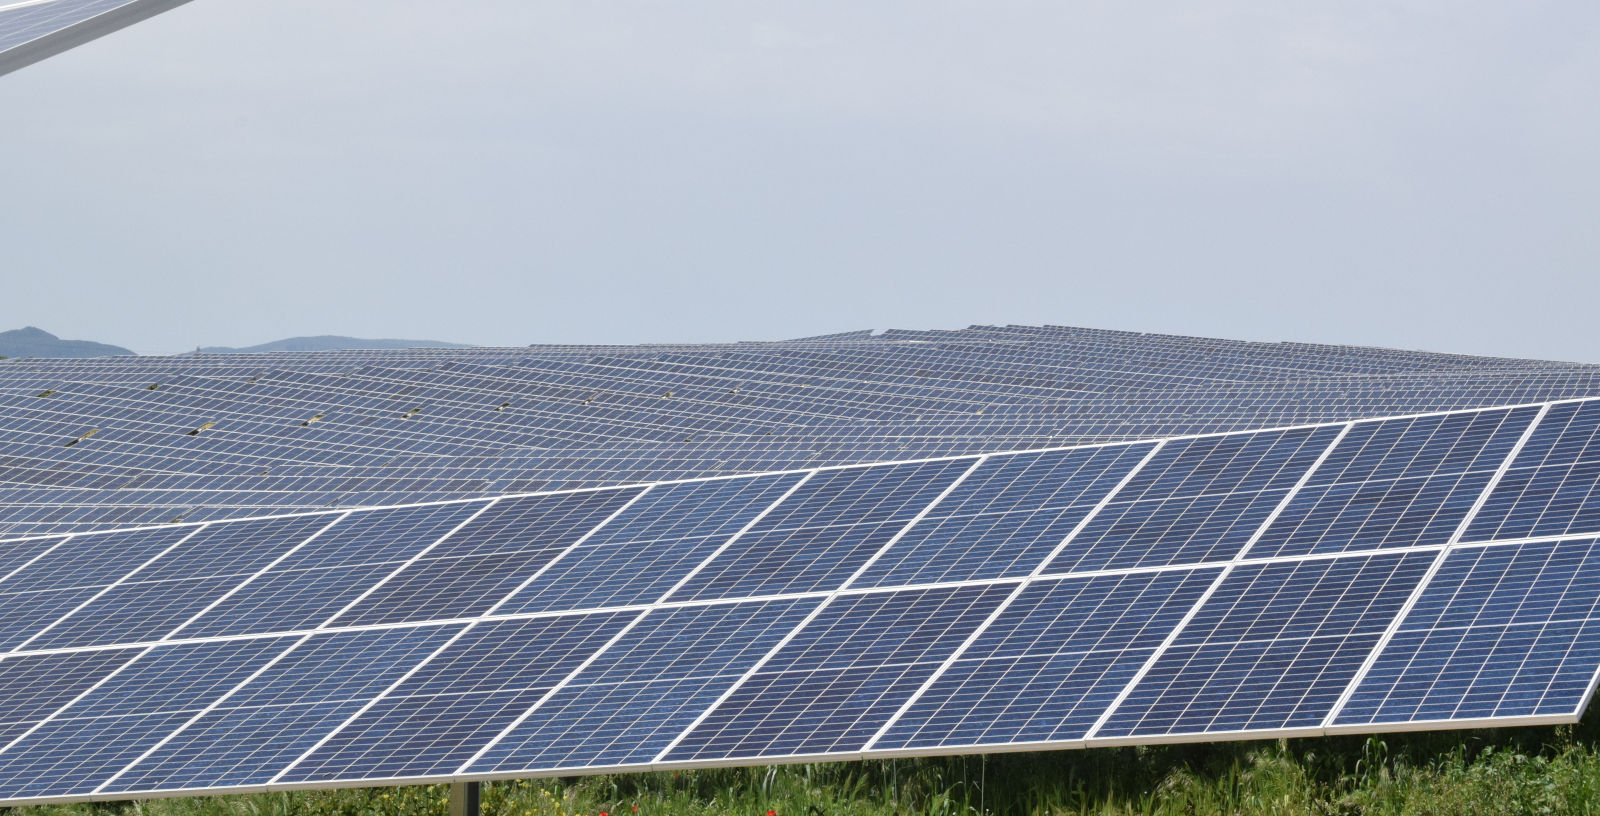 EKIAN_Fotovoltaic_Park_Basque_Country_Spain_IDOM_002